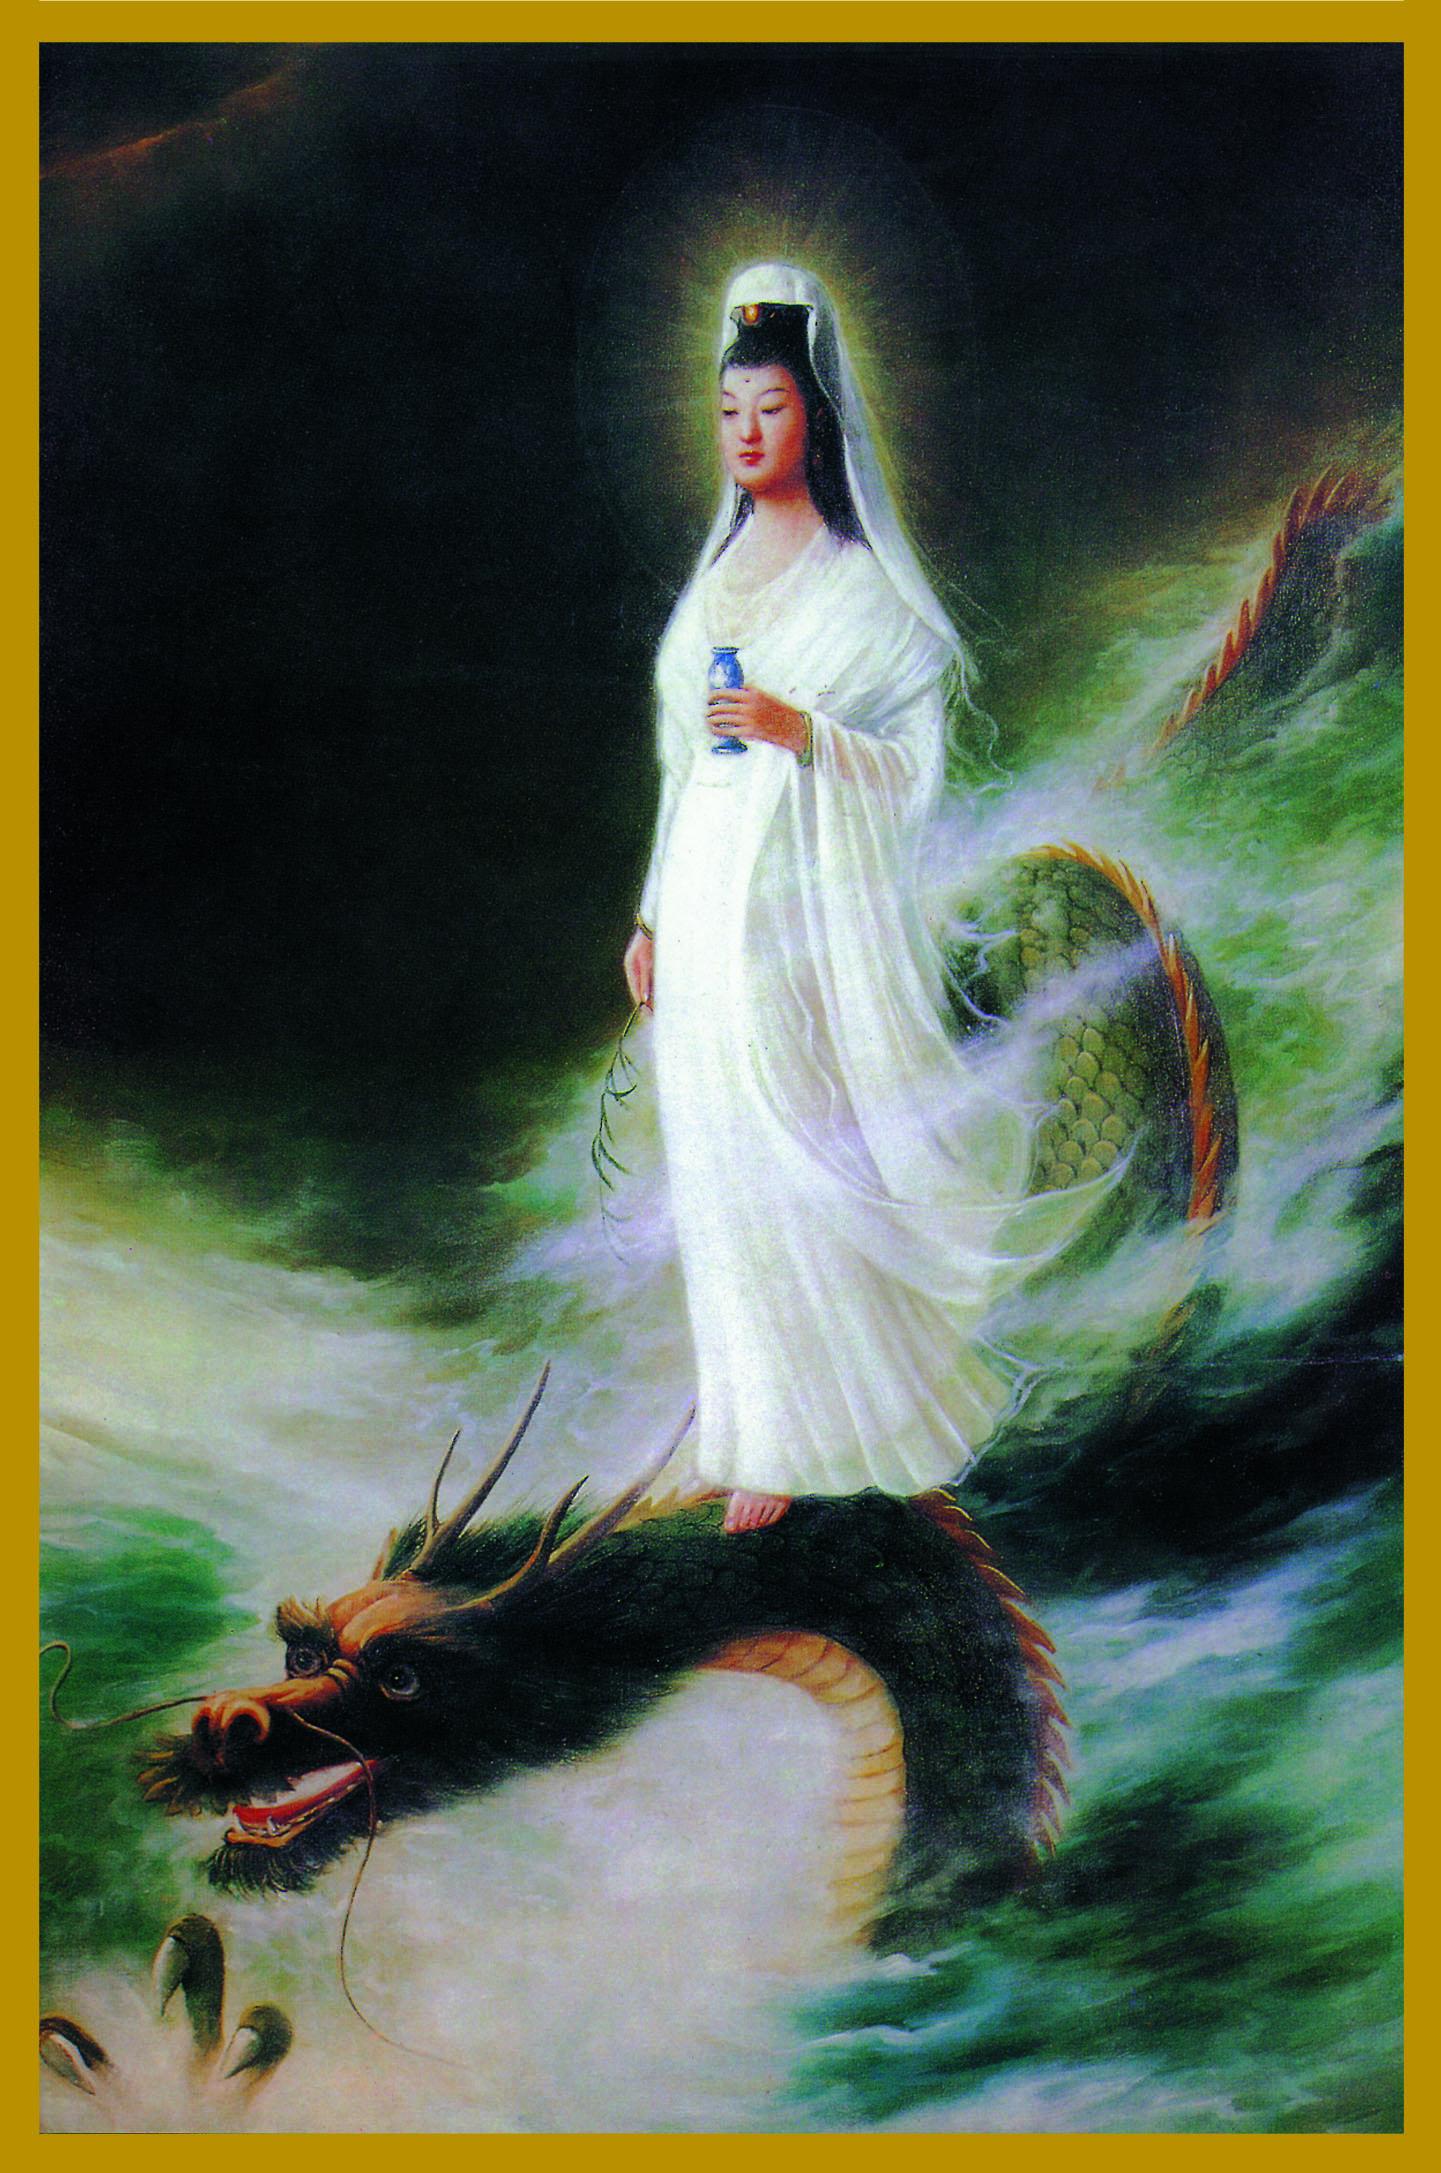 KY-DG - Kuan Yin on DragonBodhisattva of CompassionKuan Shih Yin is the Bodhisattva of Compassion. Her Name means